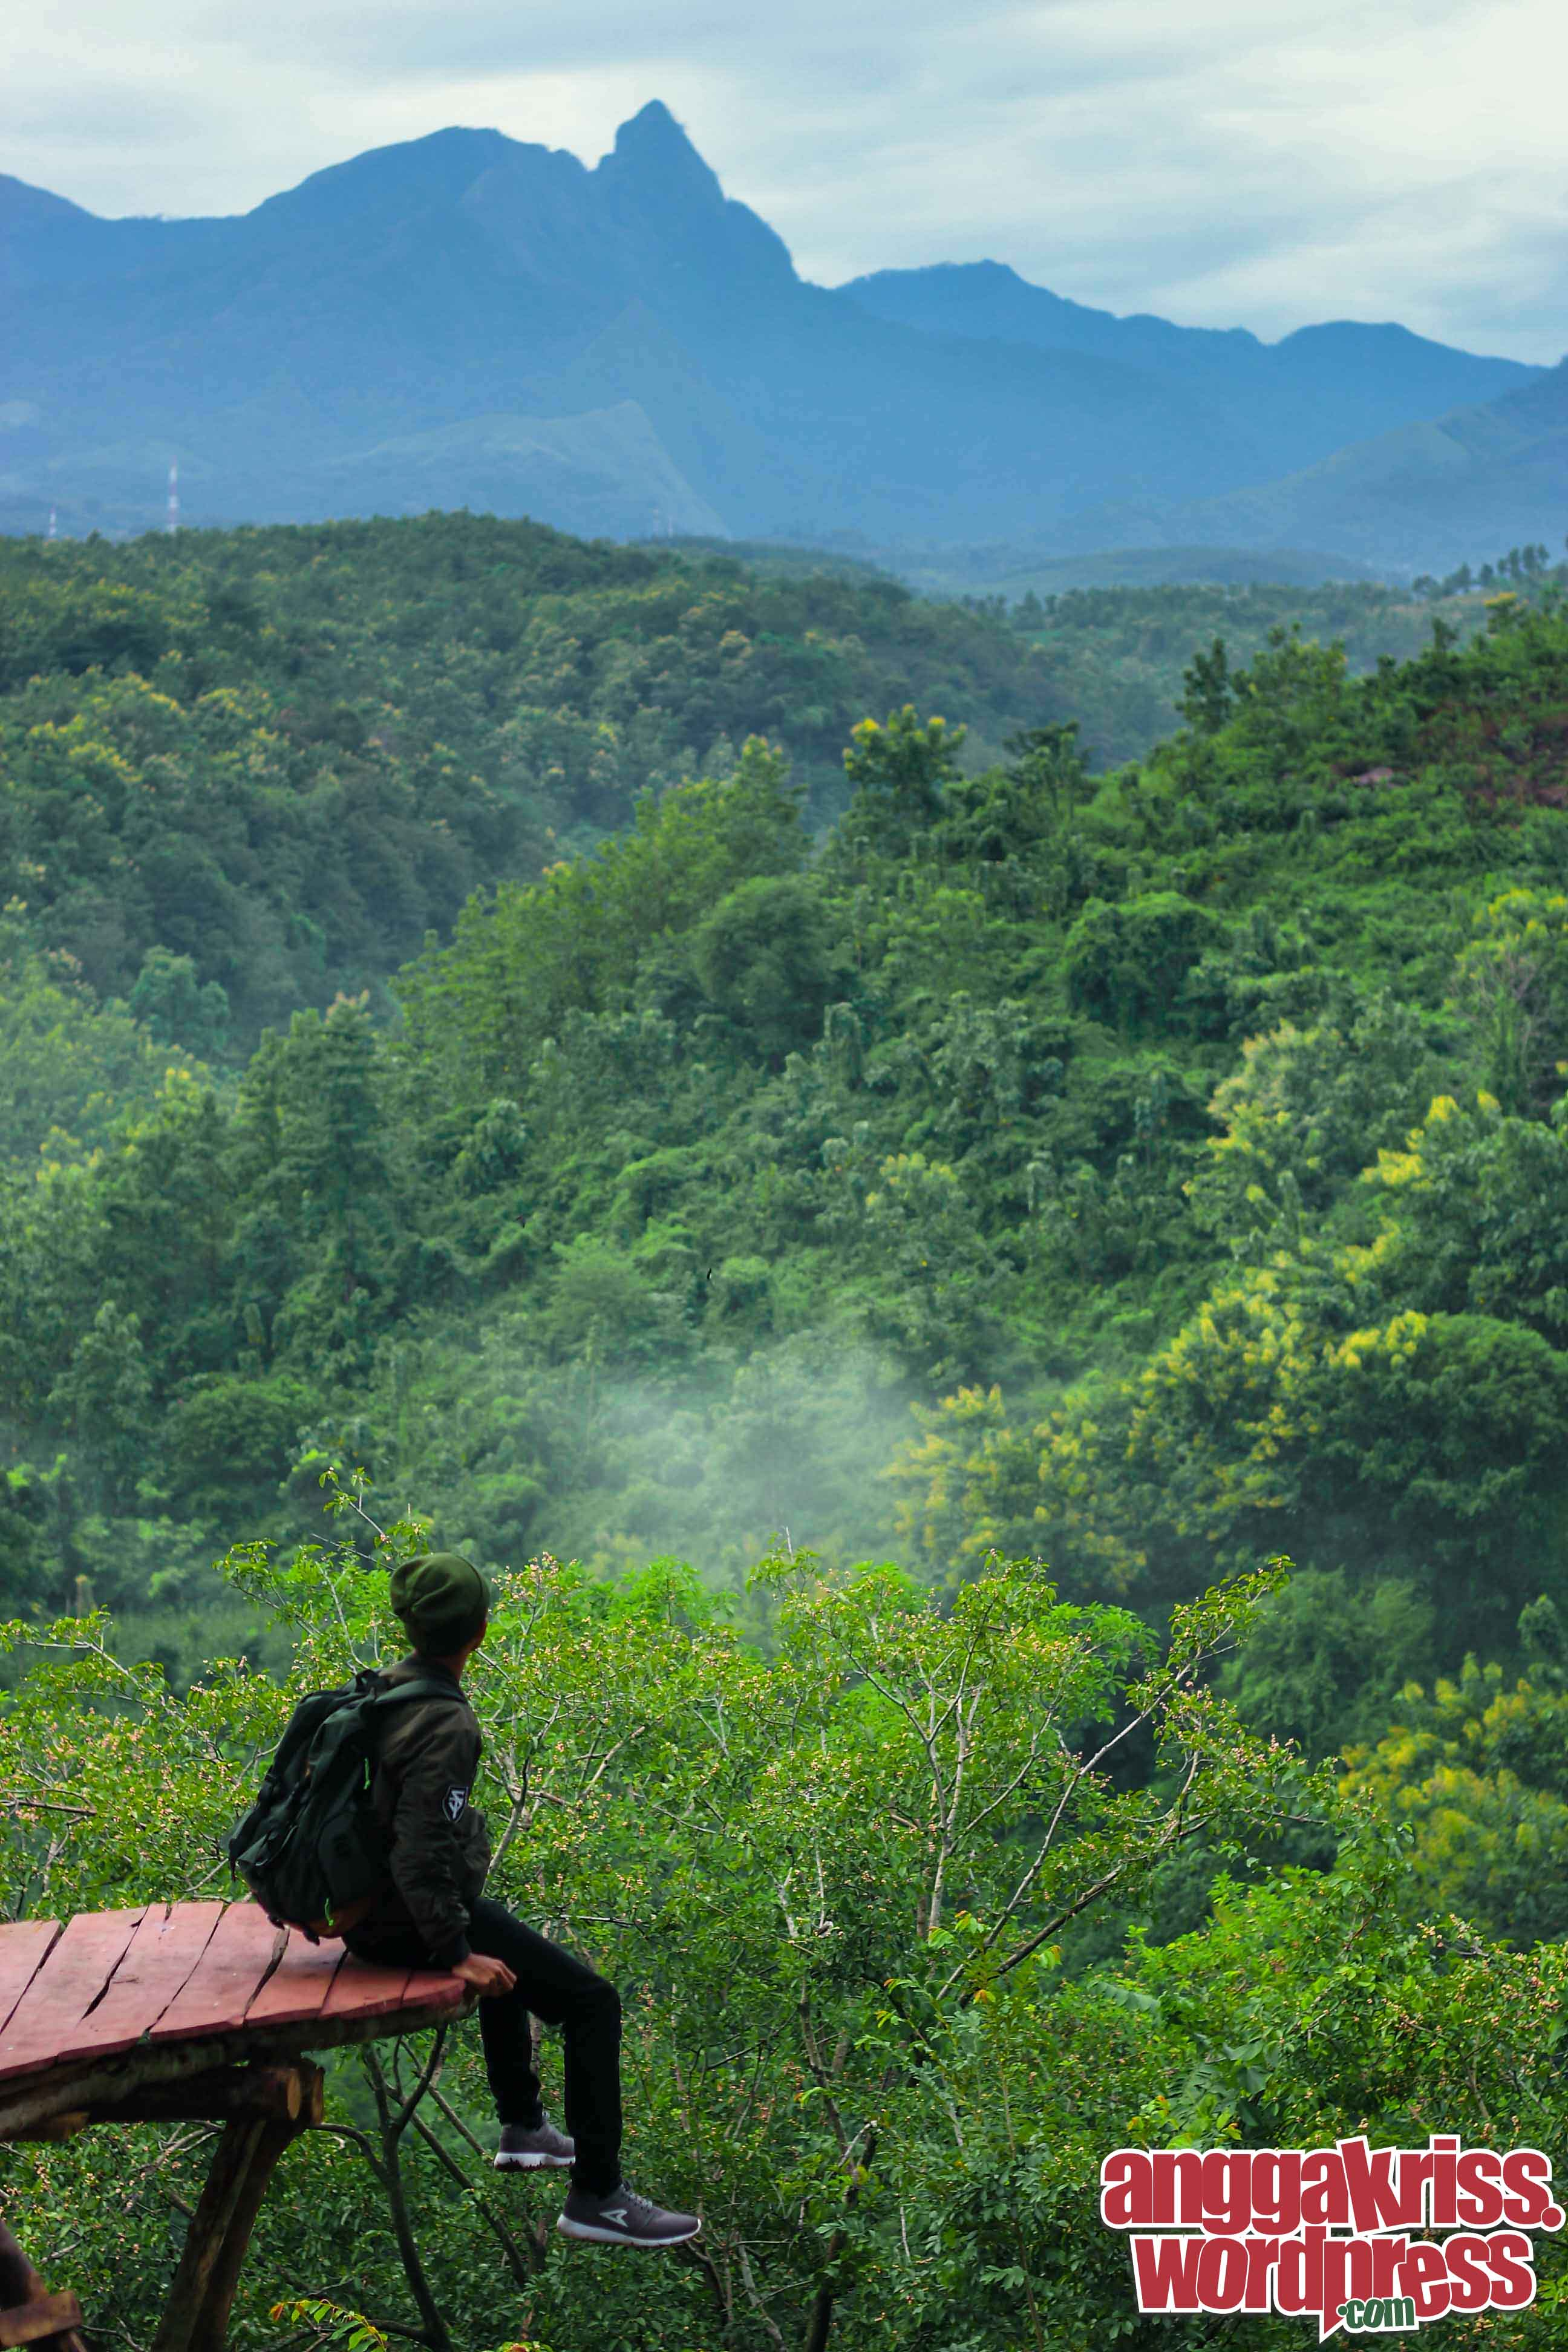 Menikmati Pagi Atas Bukit Sunrise Goa Jepang Anggakris Blog Sekelumit